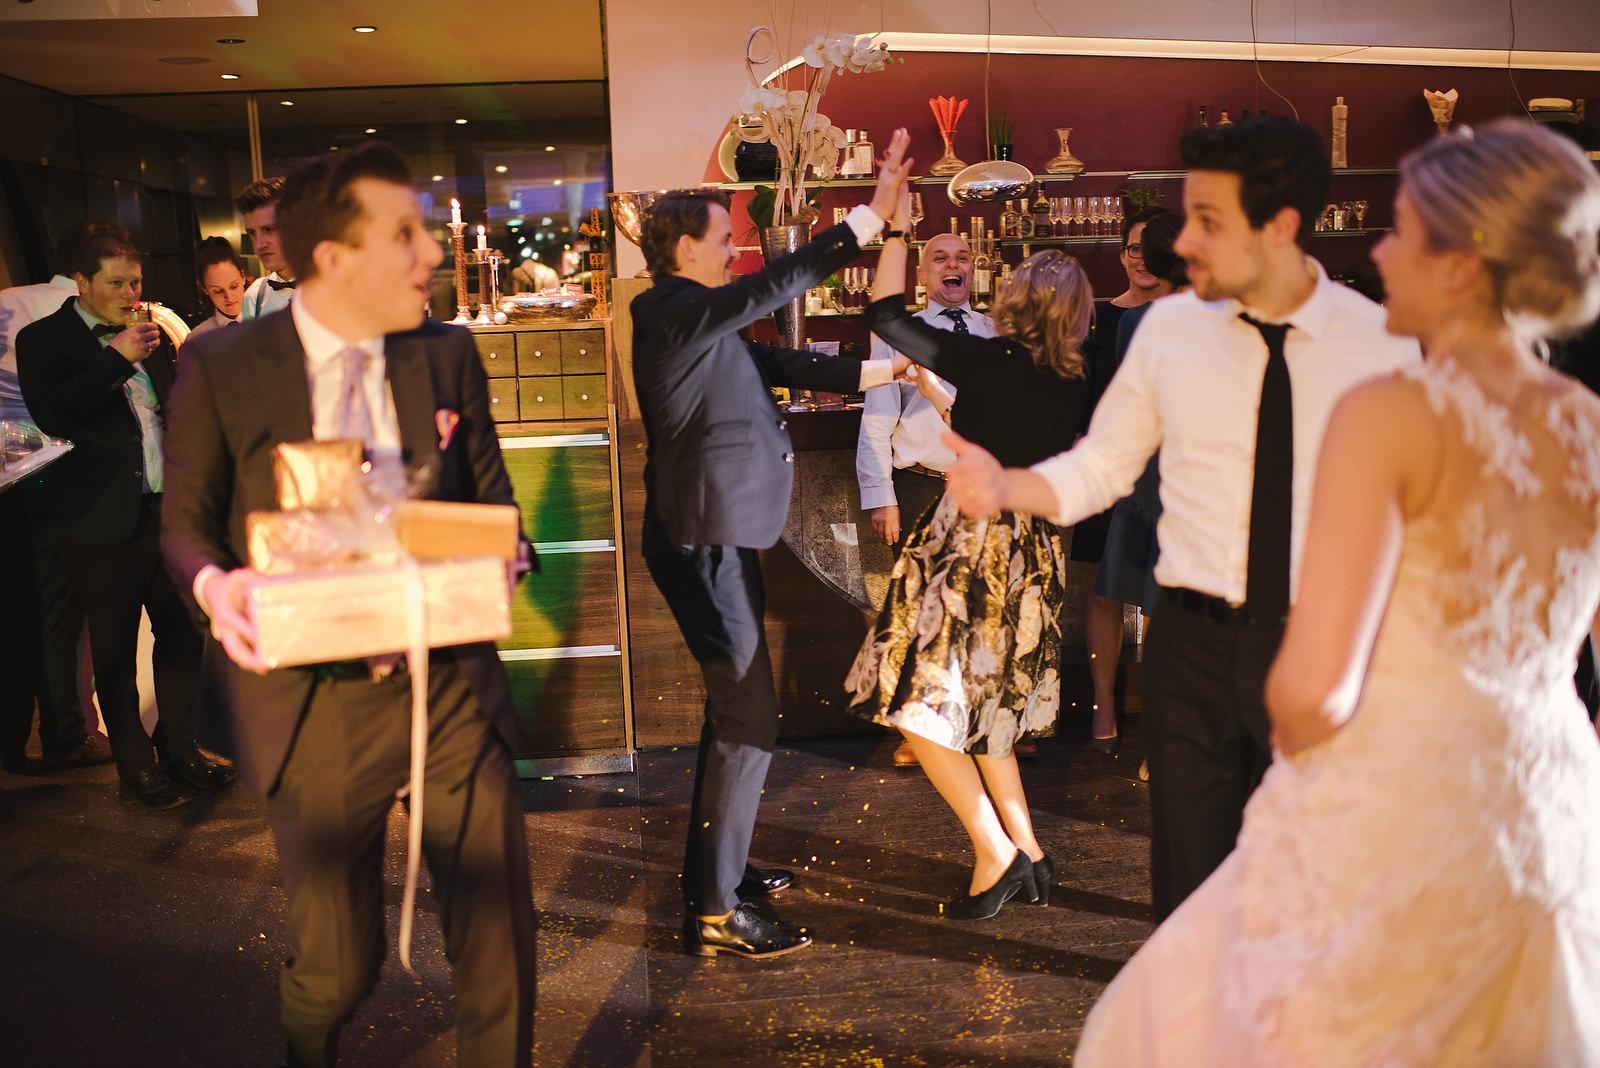 Fotograf Konstanz - Silvester Wedding in Hagnau / Friedrichshafen at Lake of Constance  - 56 -